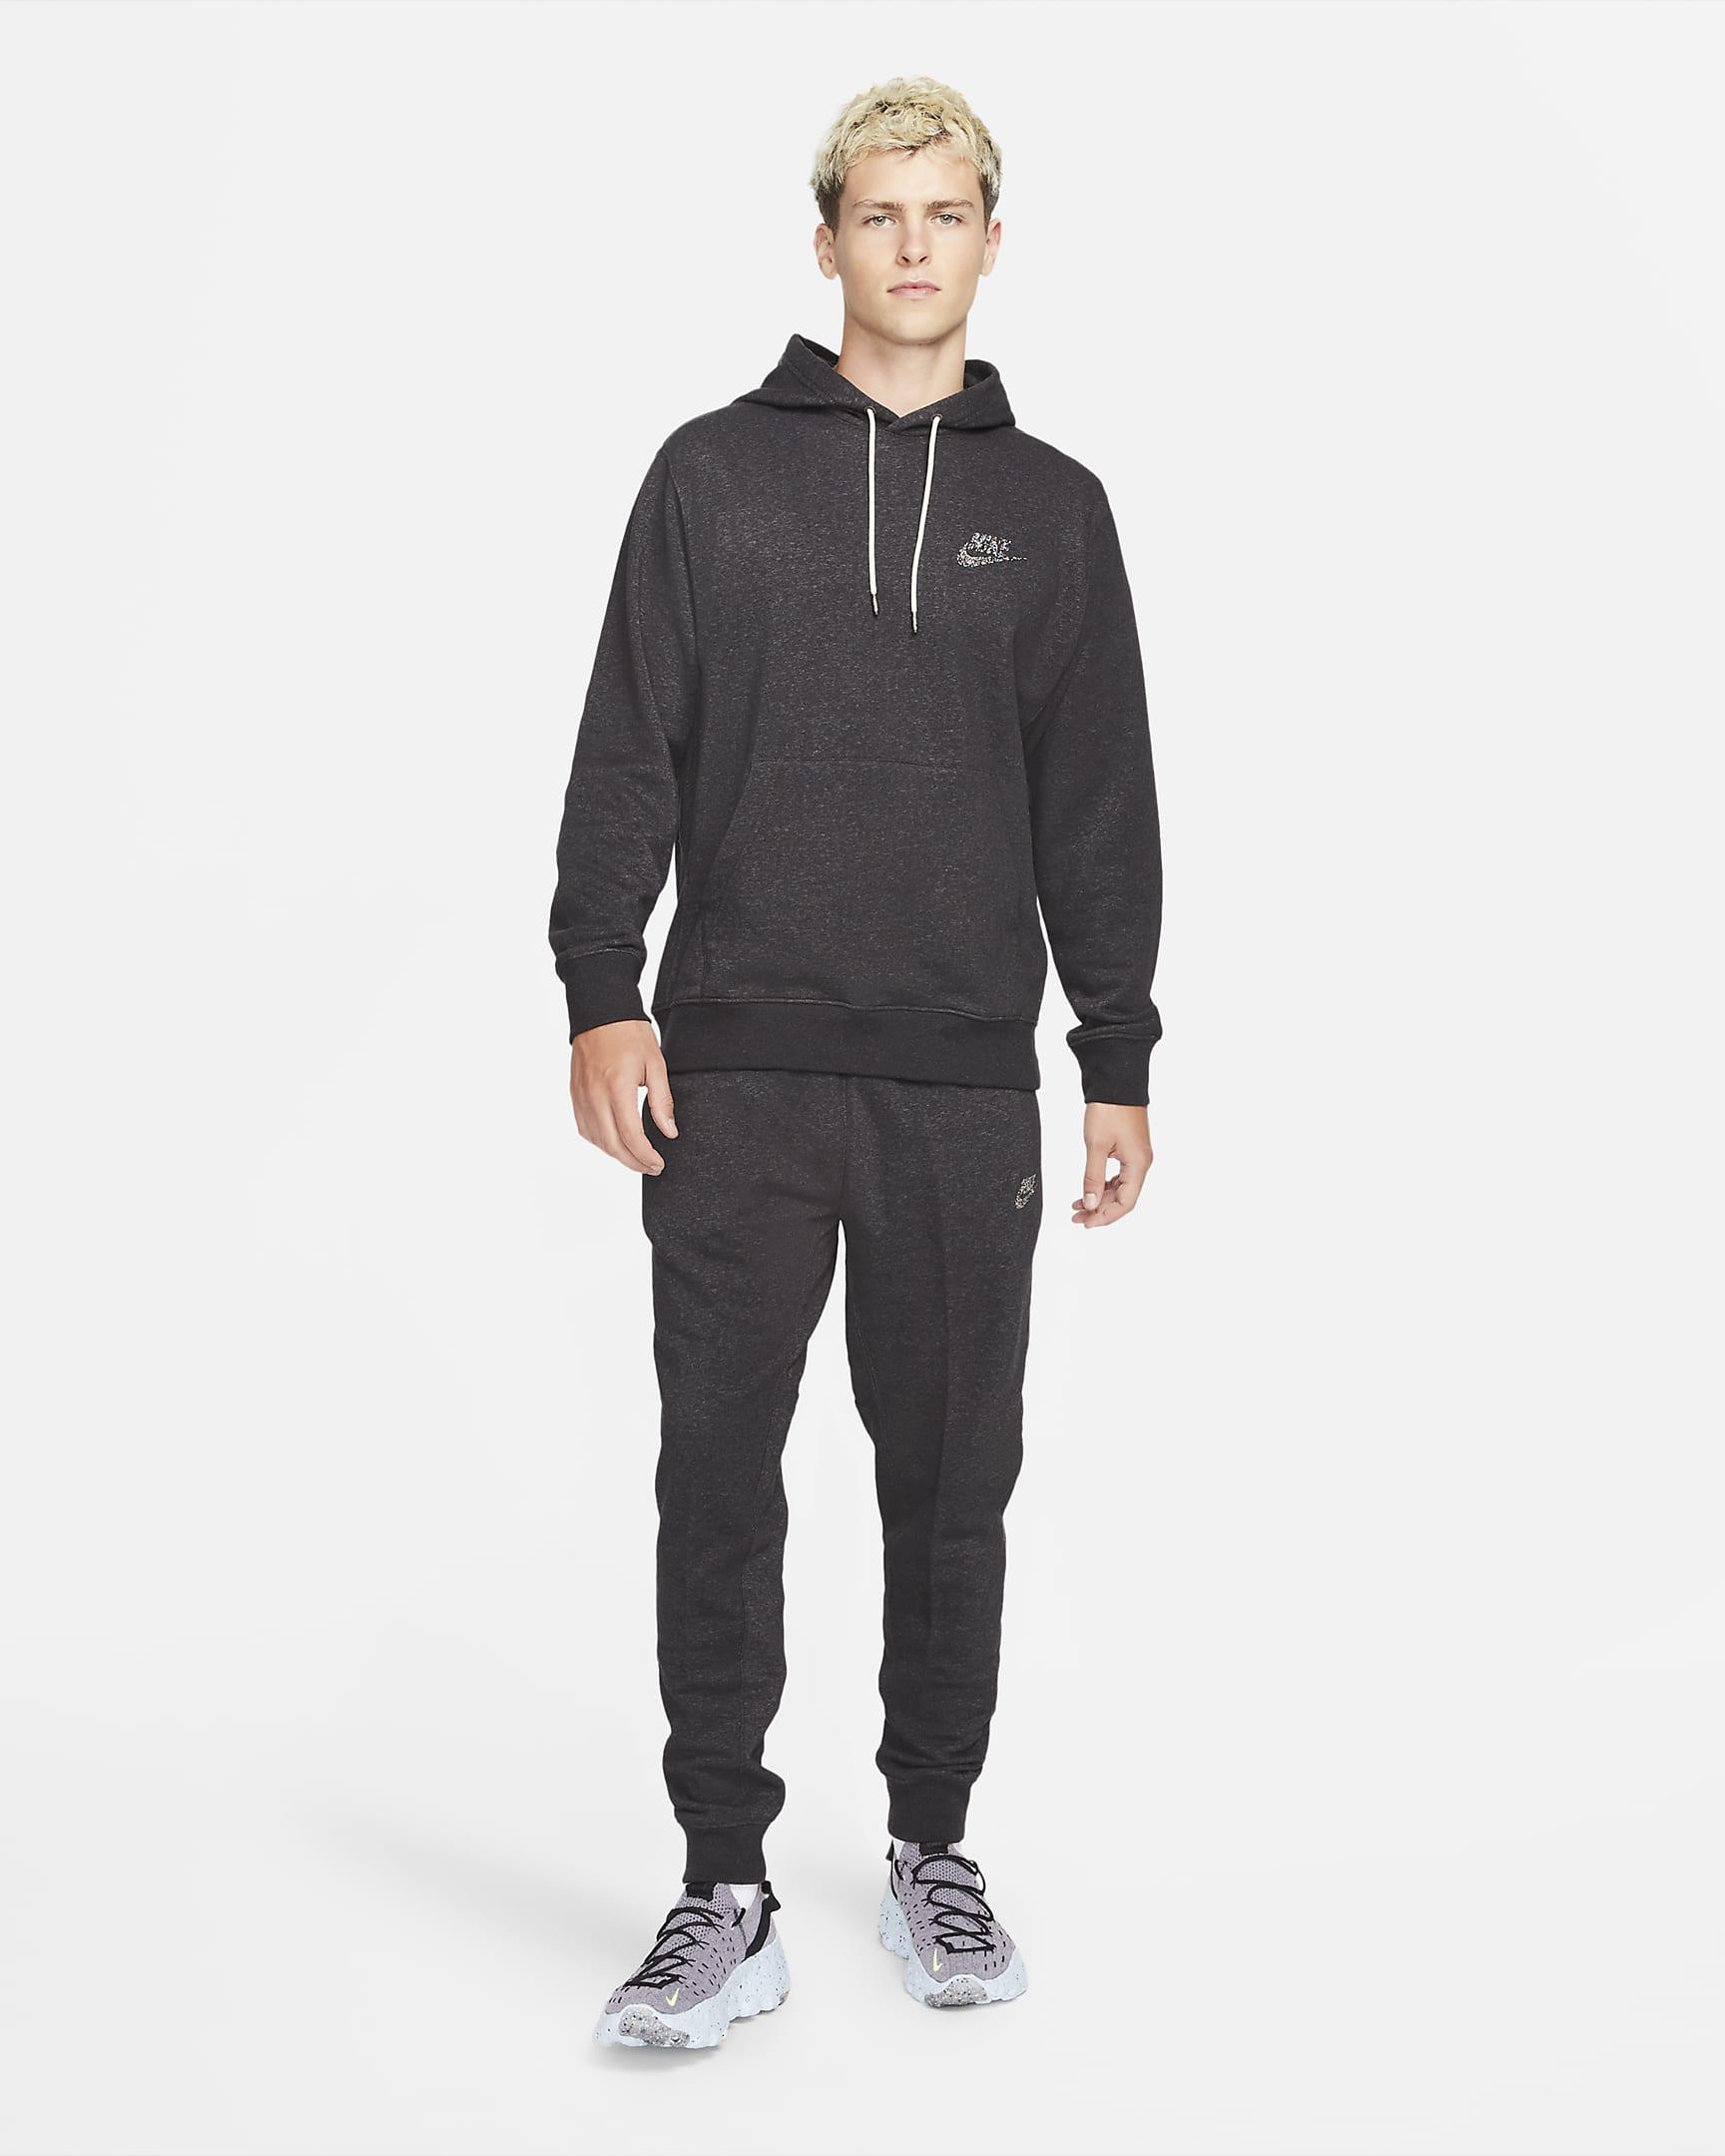 nike-sportswear-sport-essentials-mens-pullover-hoodie-XZ6DVJ-5.png